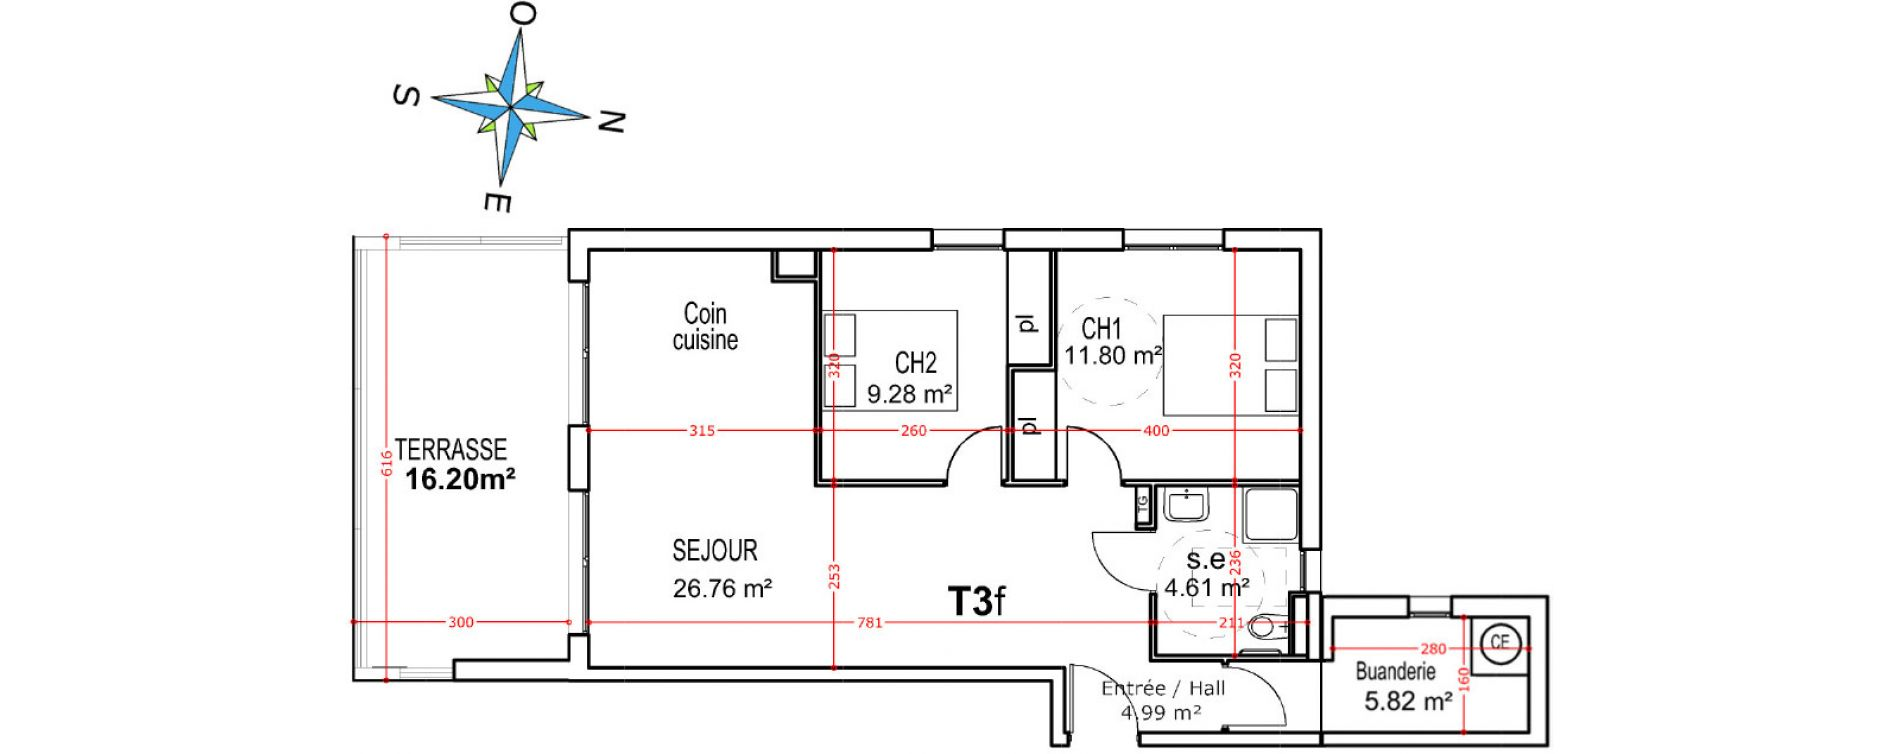 Appartement T3 de 63,26 m2 à Castellare-Di-Casinca Centre